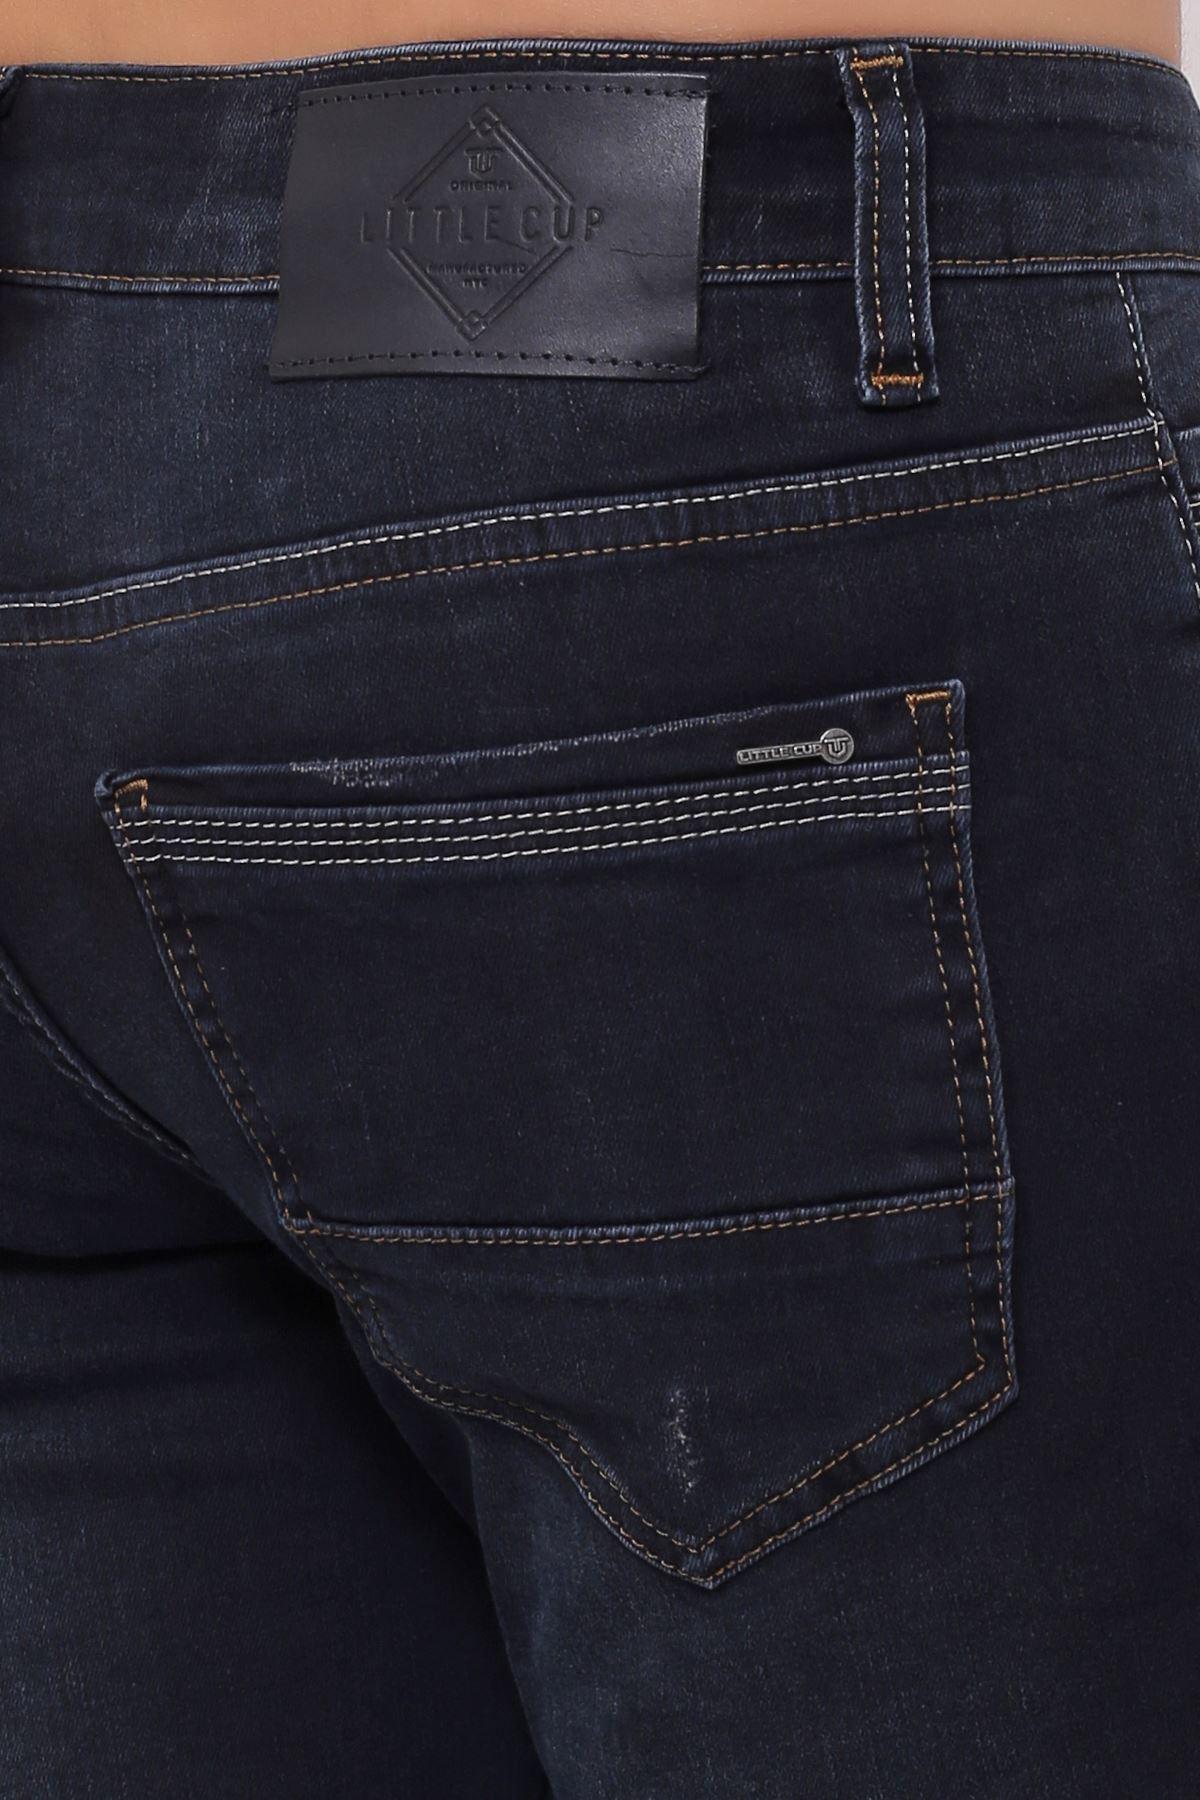 Yeni Blue Black Slim Fit Fermuarlı Erkek Jeans Pantolon